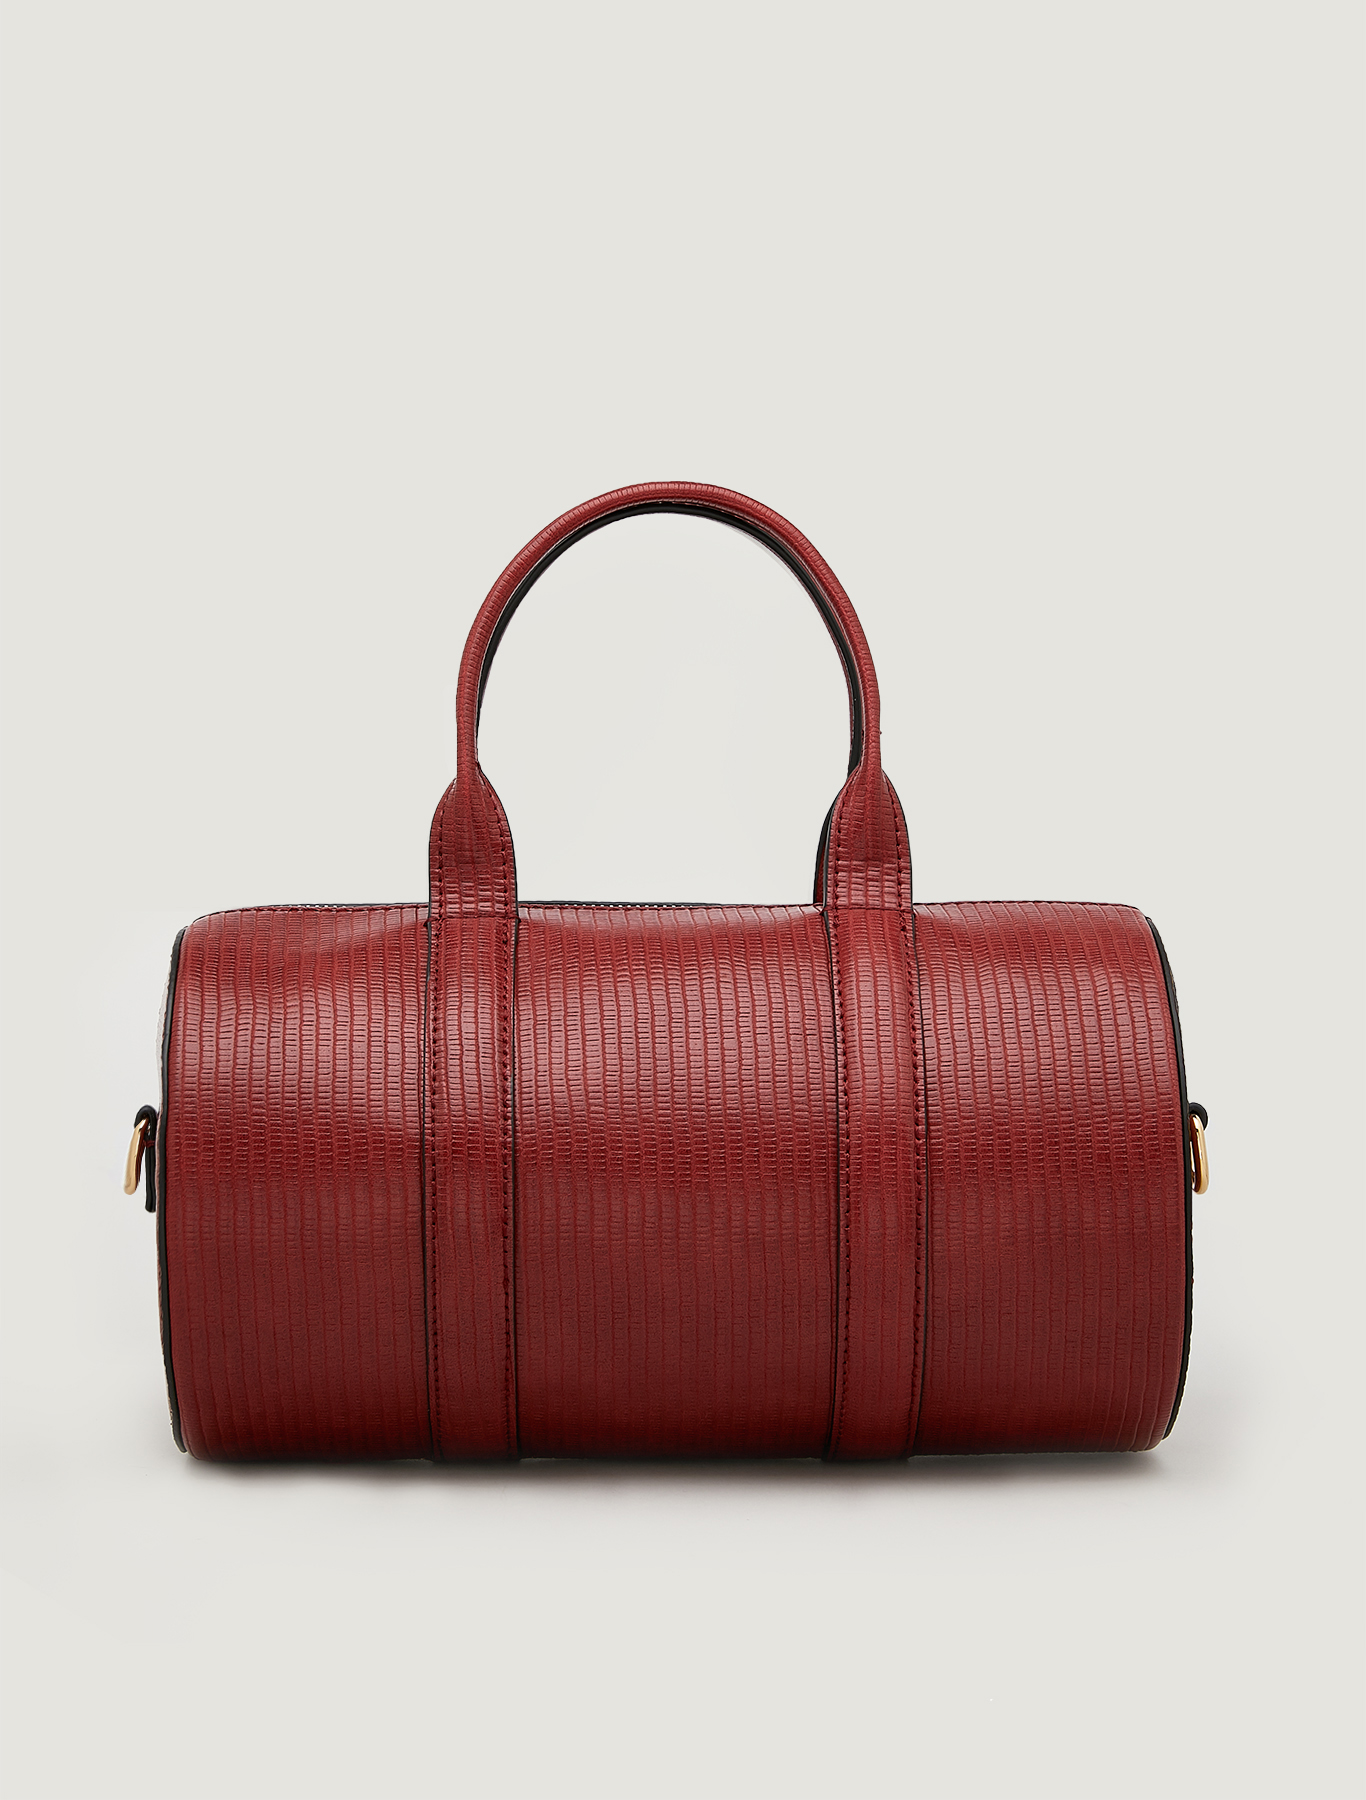 Barrel bag with lizard print - rust - pennyblack